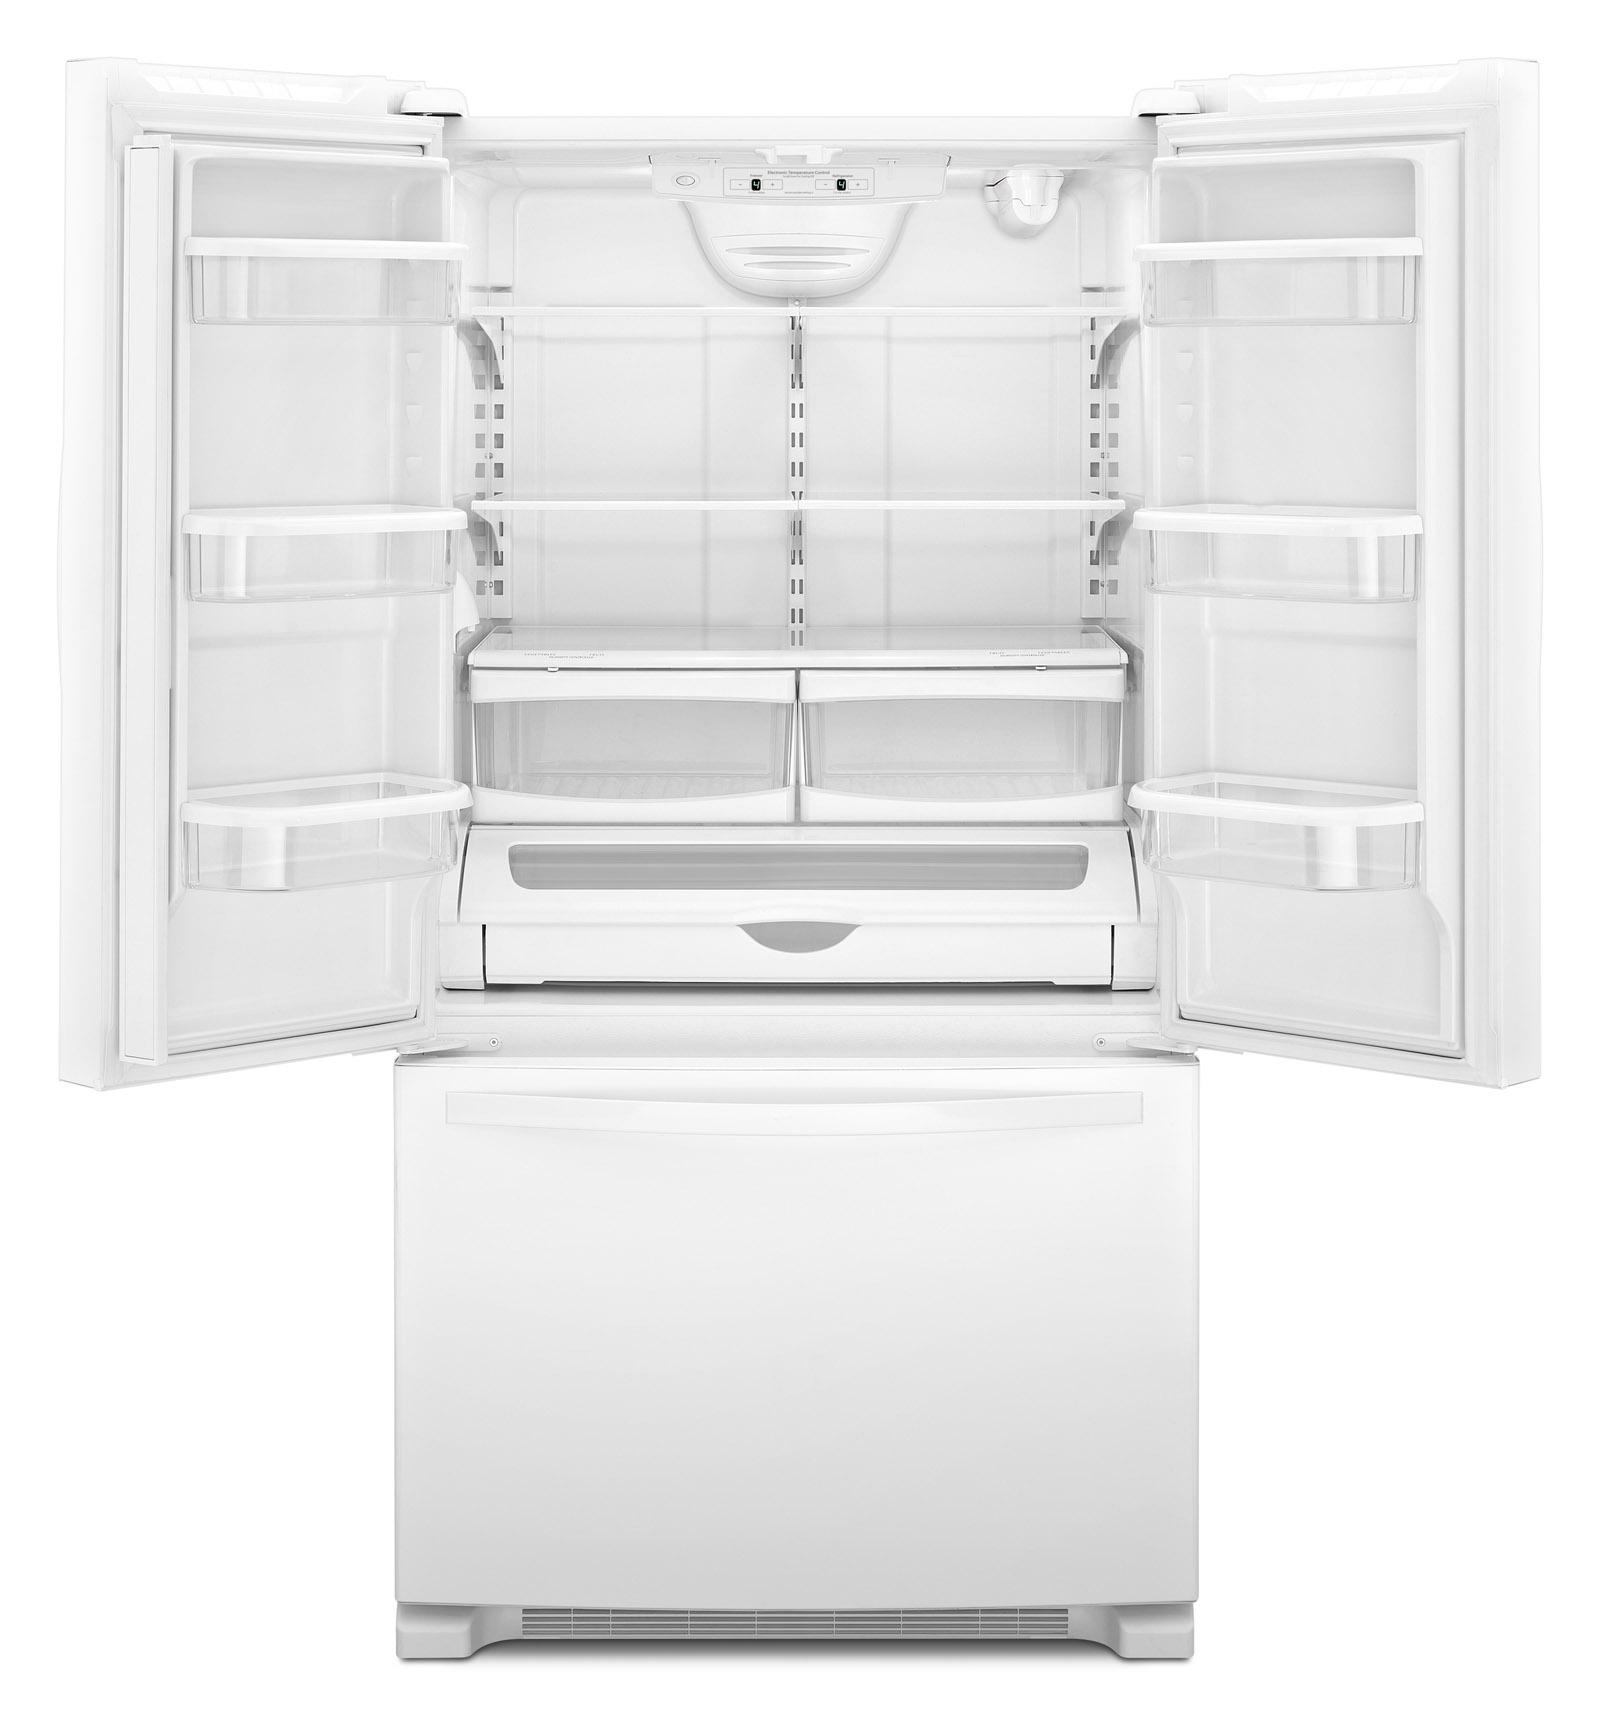 Whirlpool 22 cu. ft. French Door Bottom Freezer Refrigerator w/ Adaptive Defrost - White